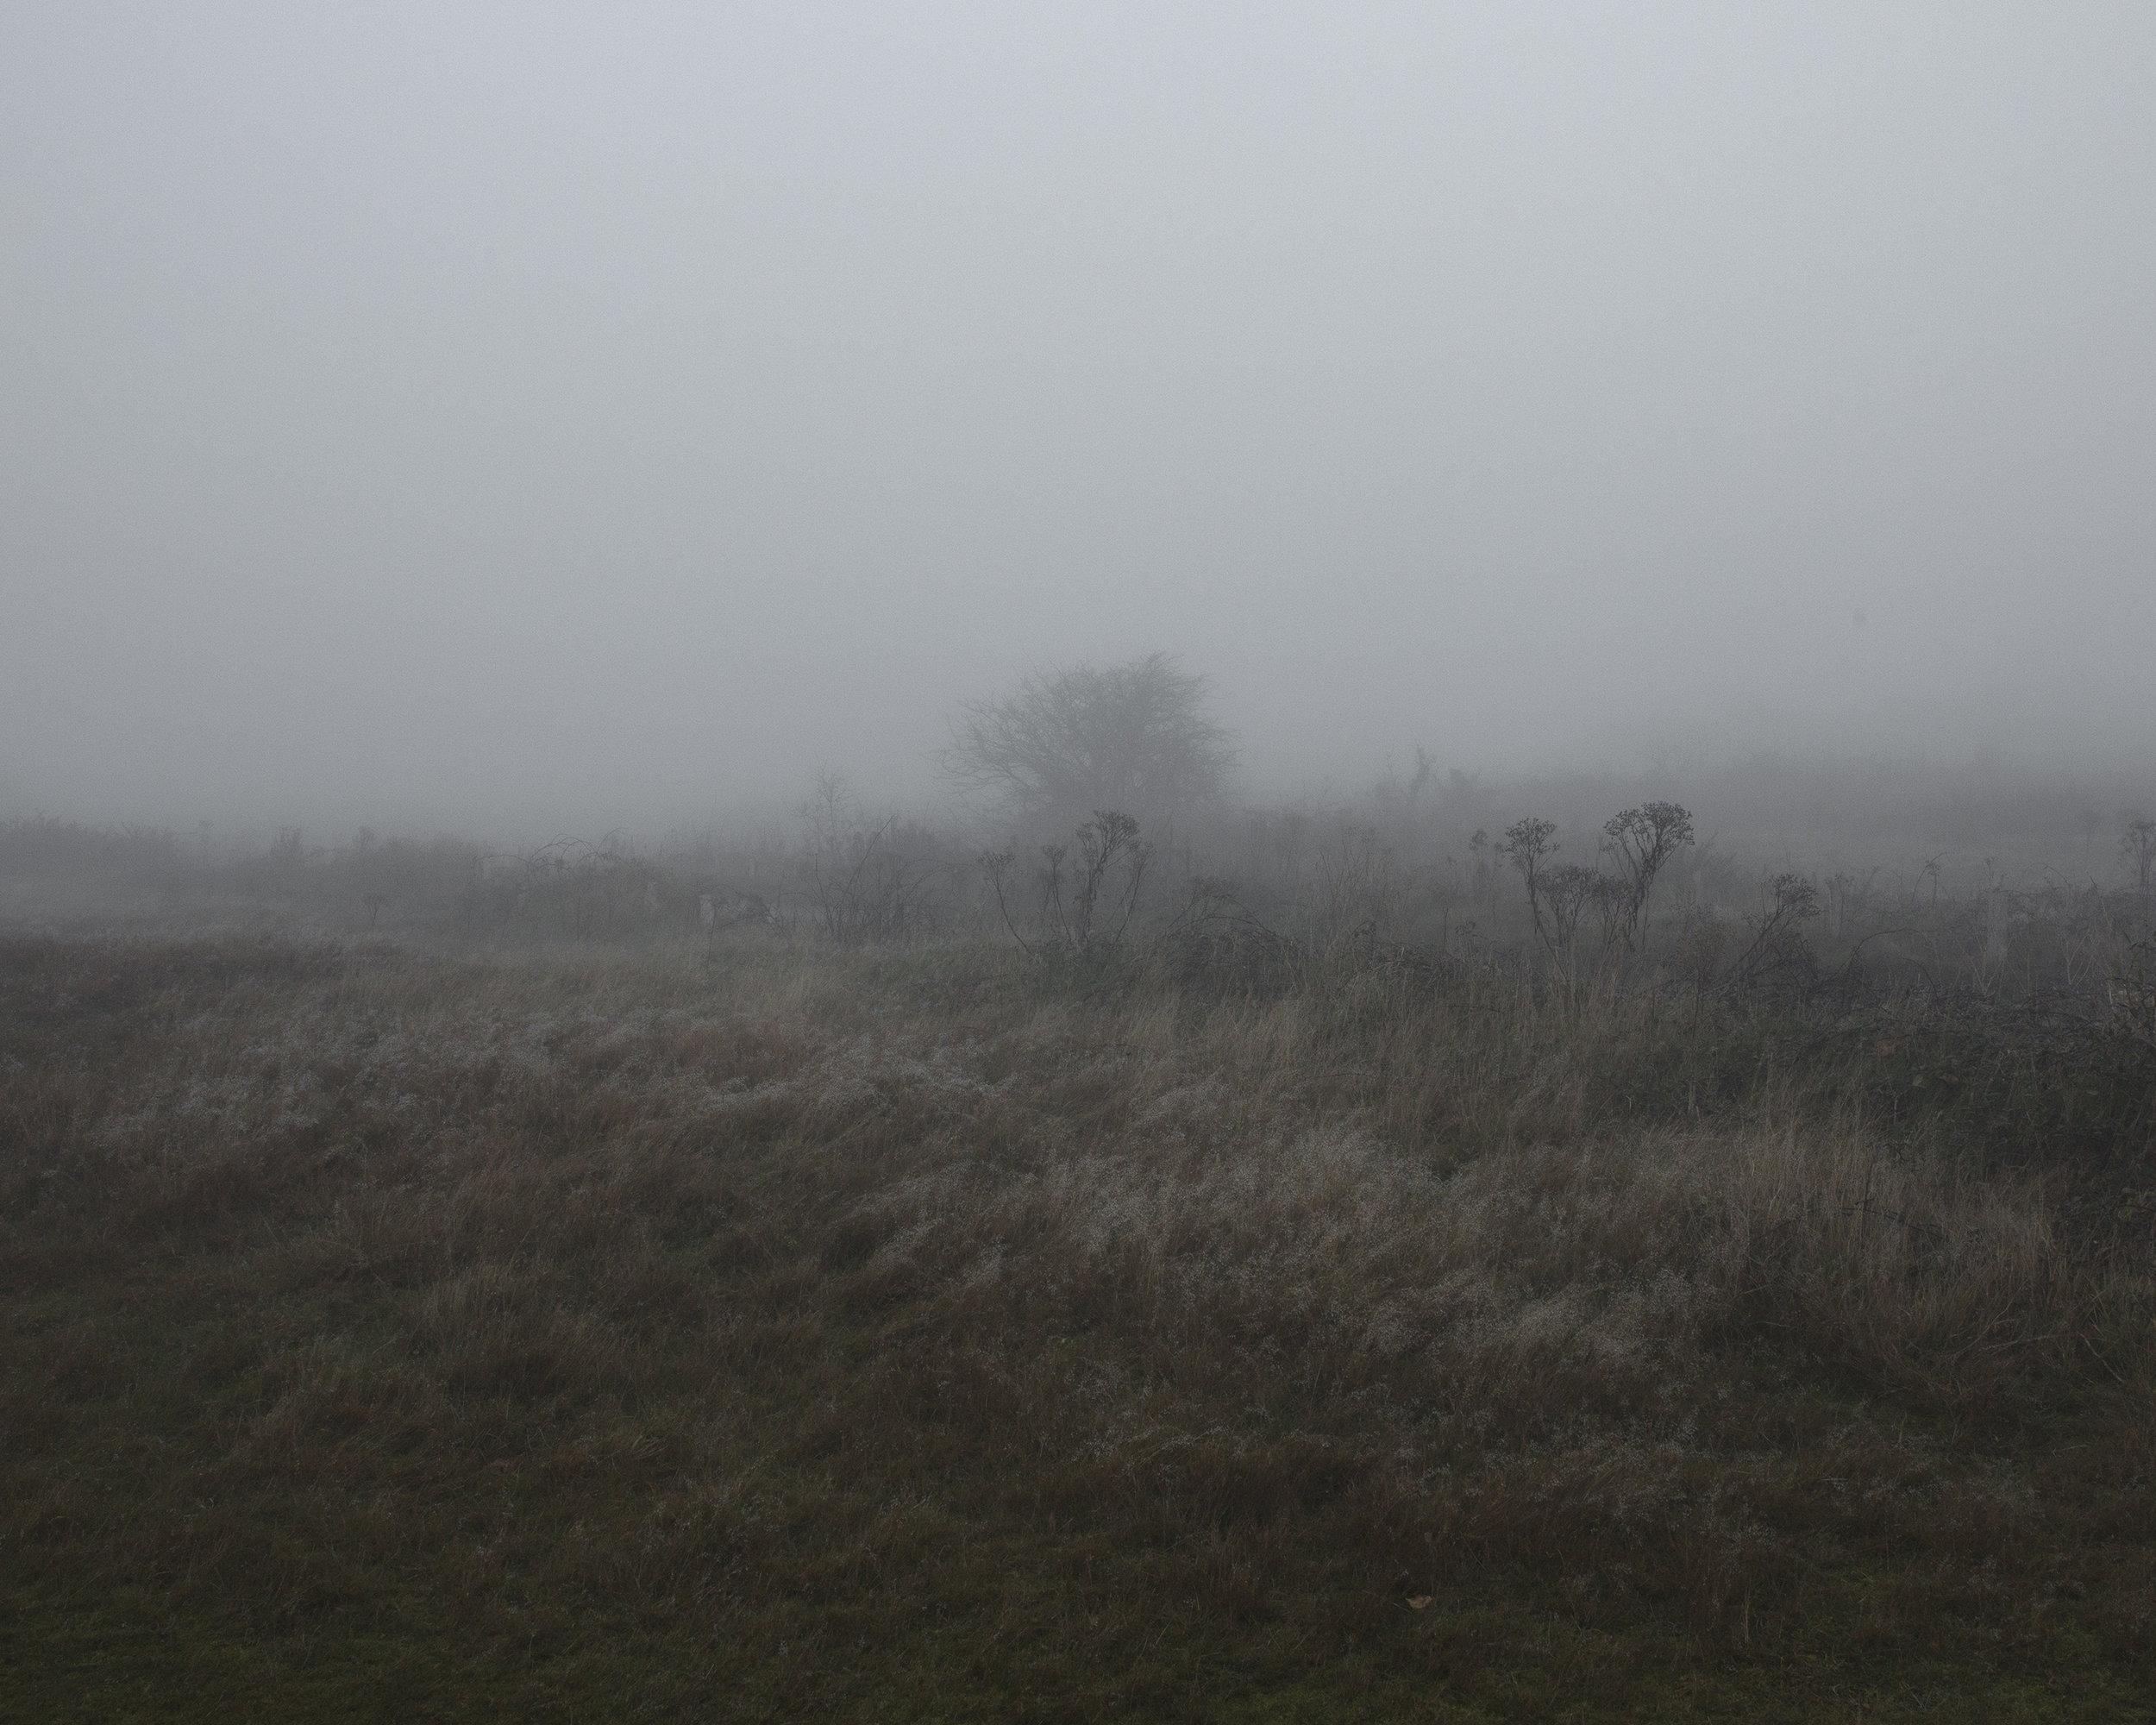 20161230_5th anniversary fog_0189.jpg